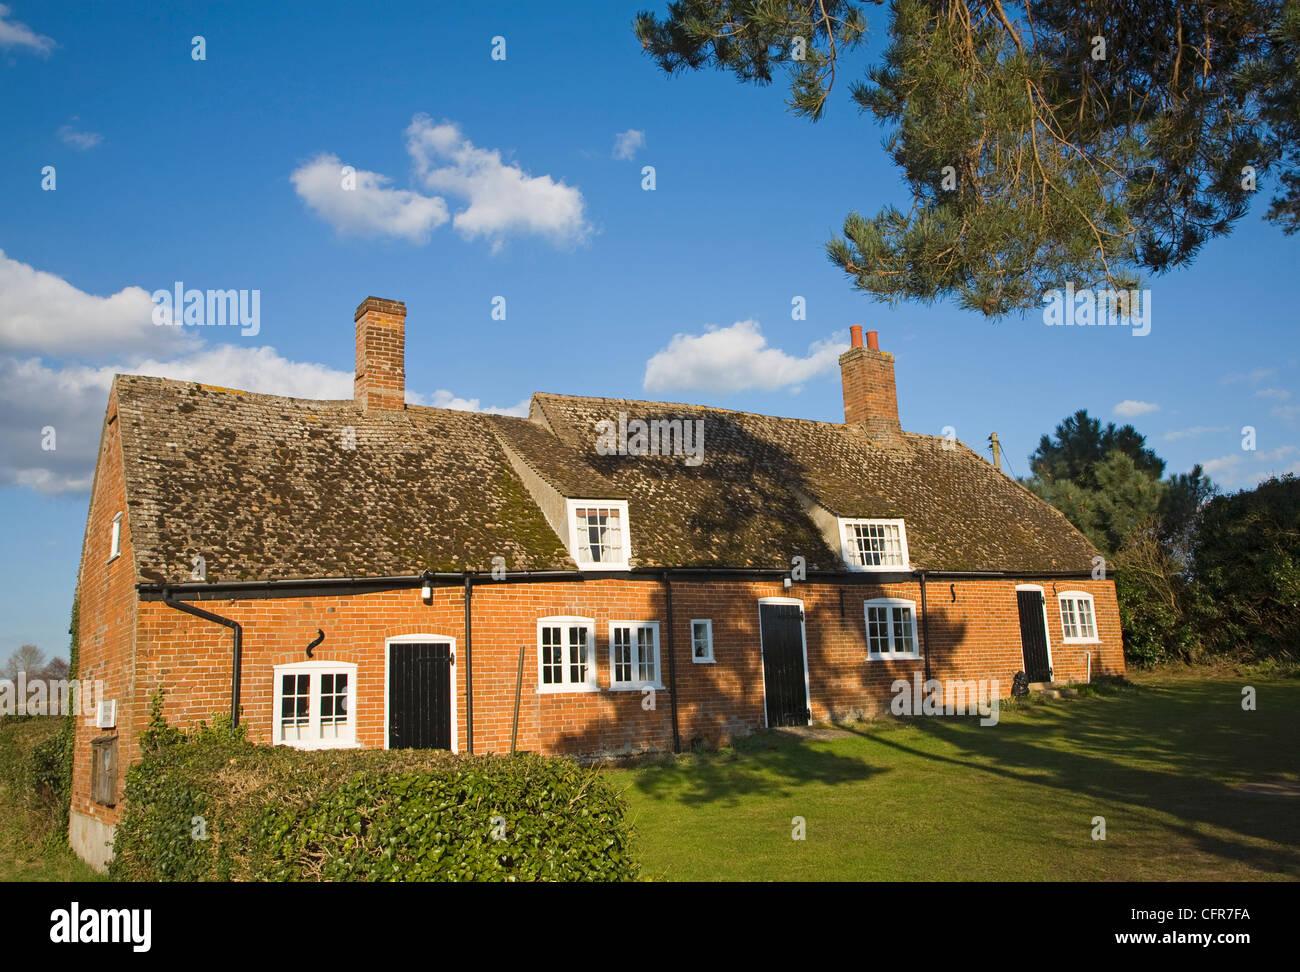 Former cottages merged to form village hall, The Trust Hall, Shottisham, Suffolk, England - Stock Image